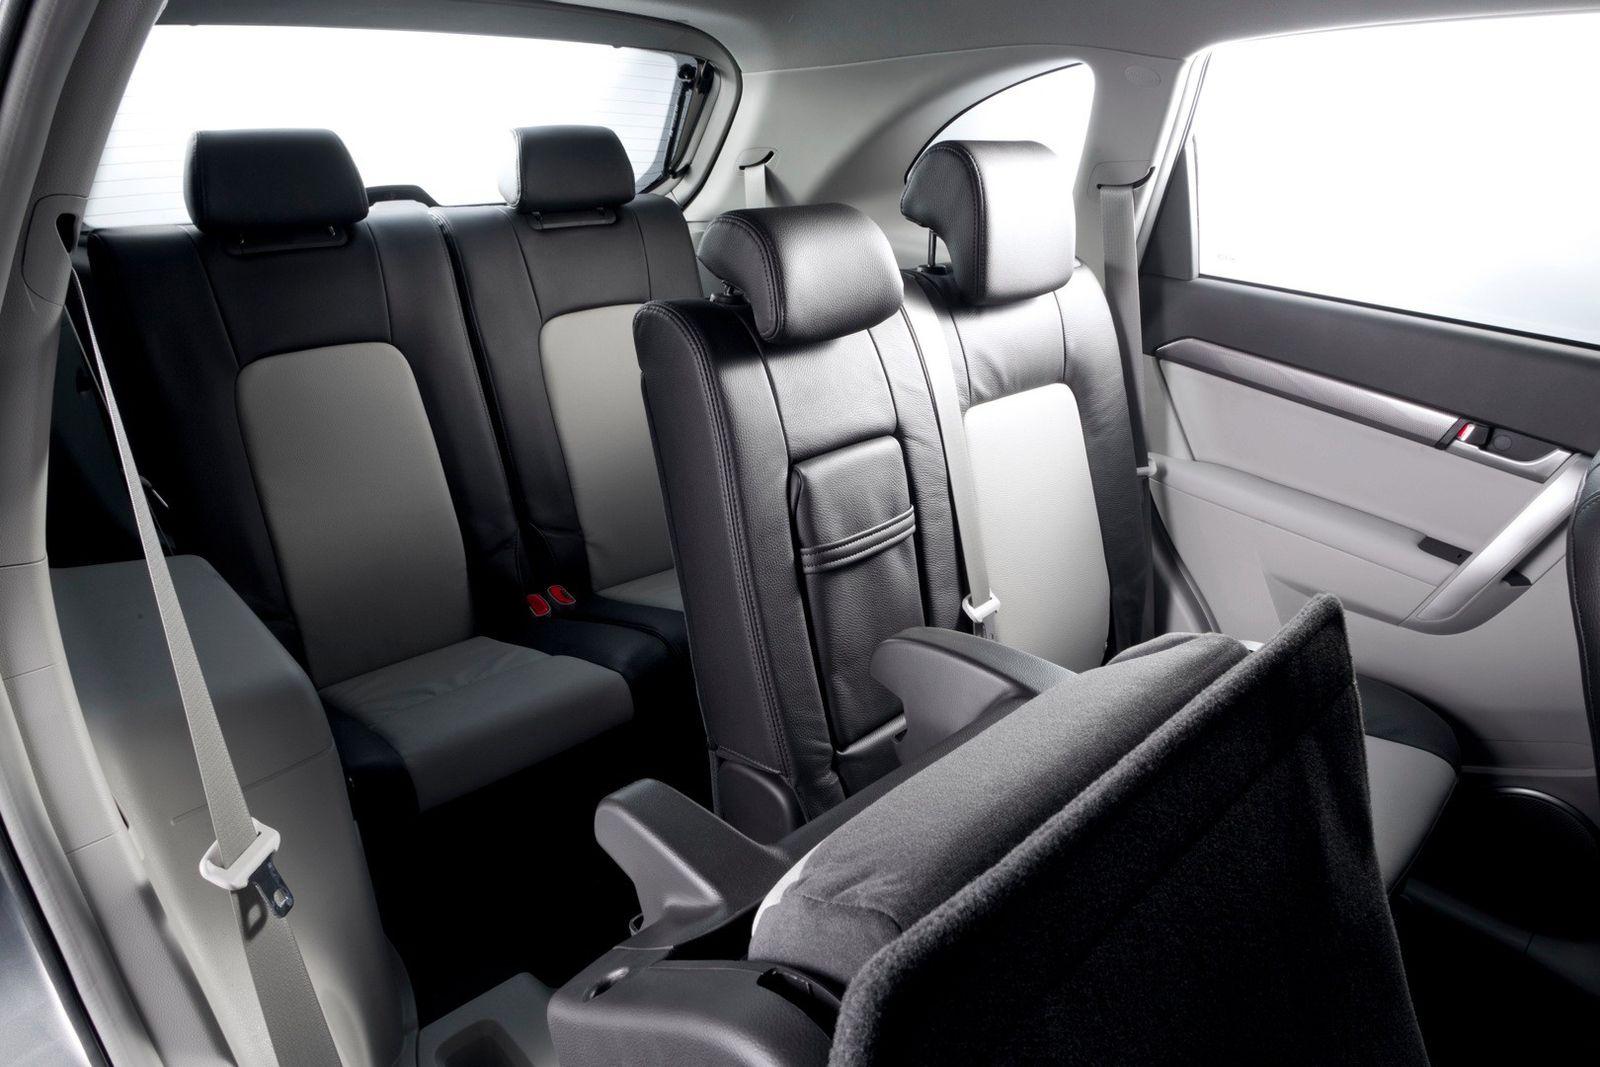 Kekurangan Chevrolet Captiva 2011 Murah Berkualitas